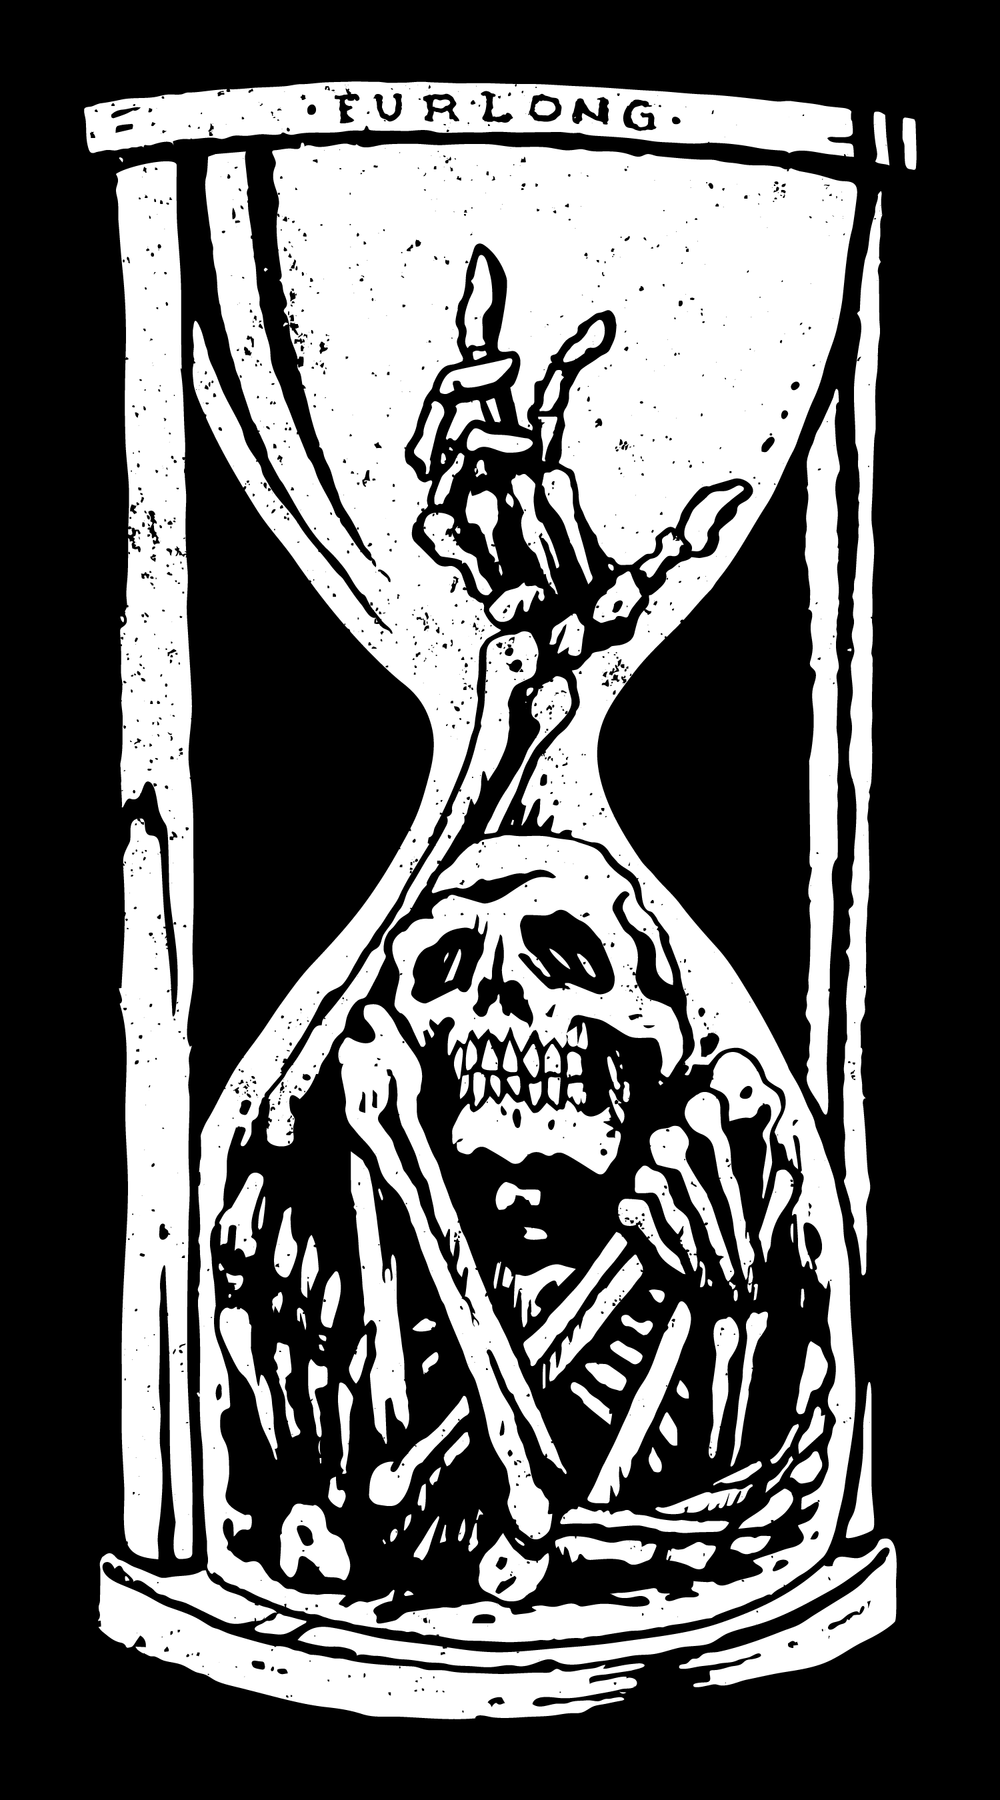 Furlong-Hourglass_Katits.png